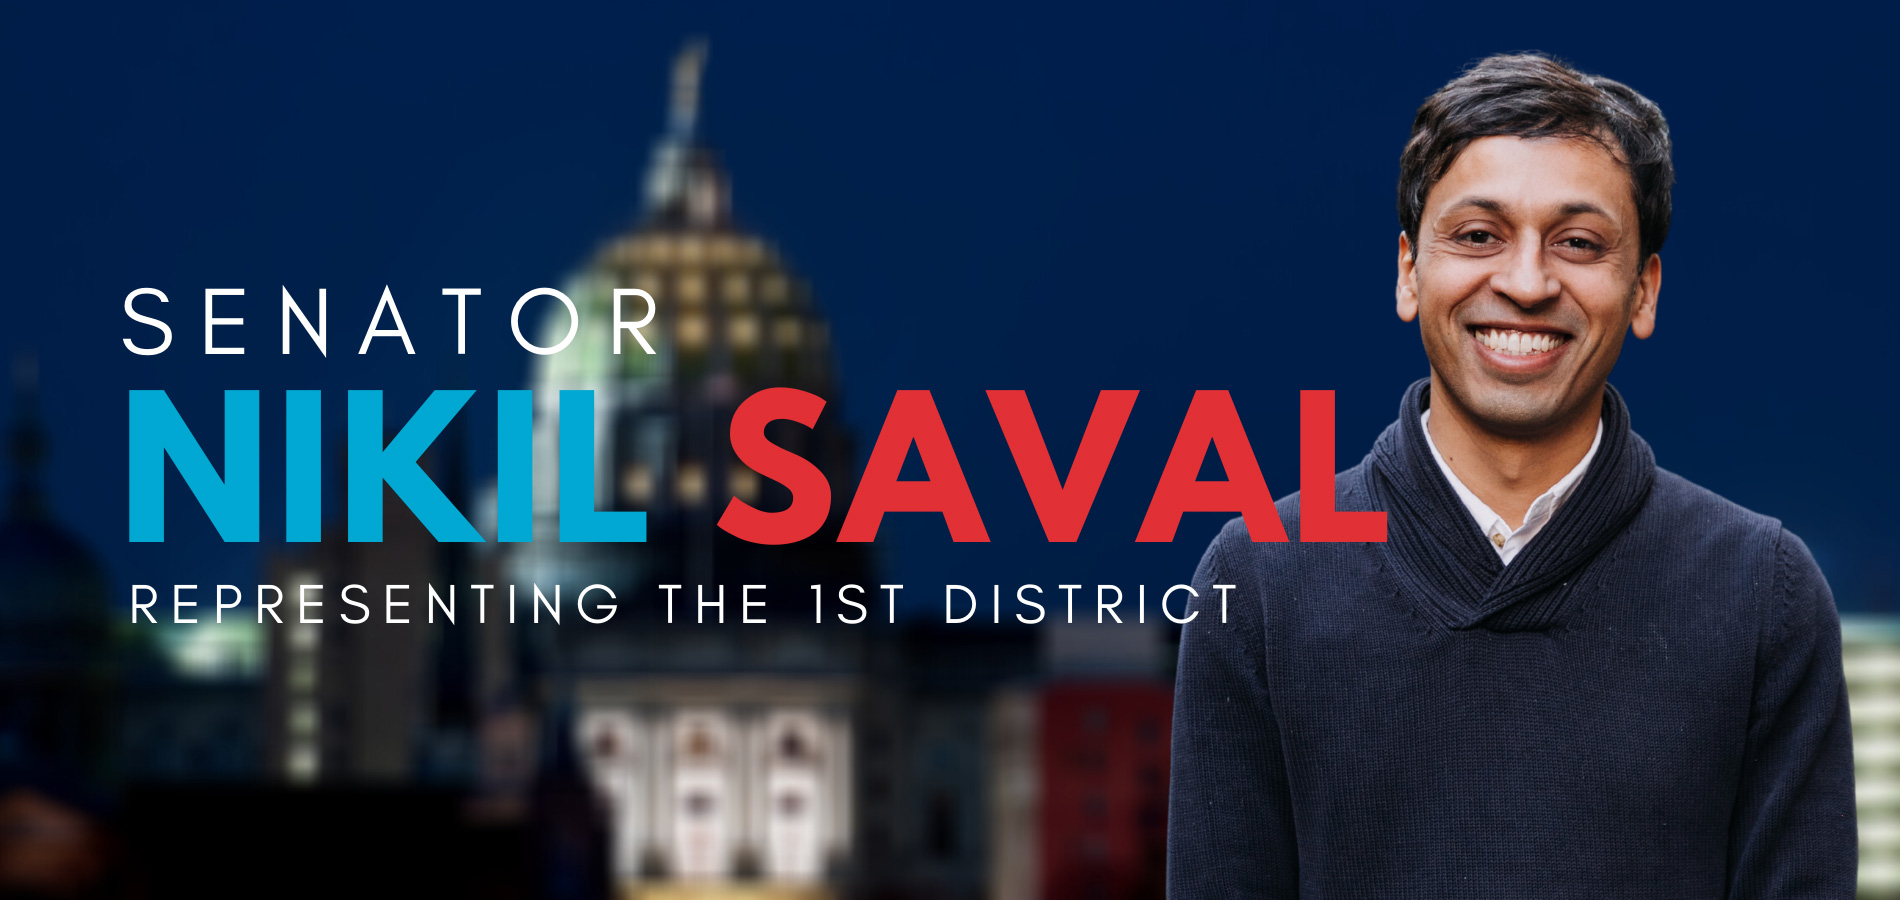 Senator-Elect Nikil Saval